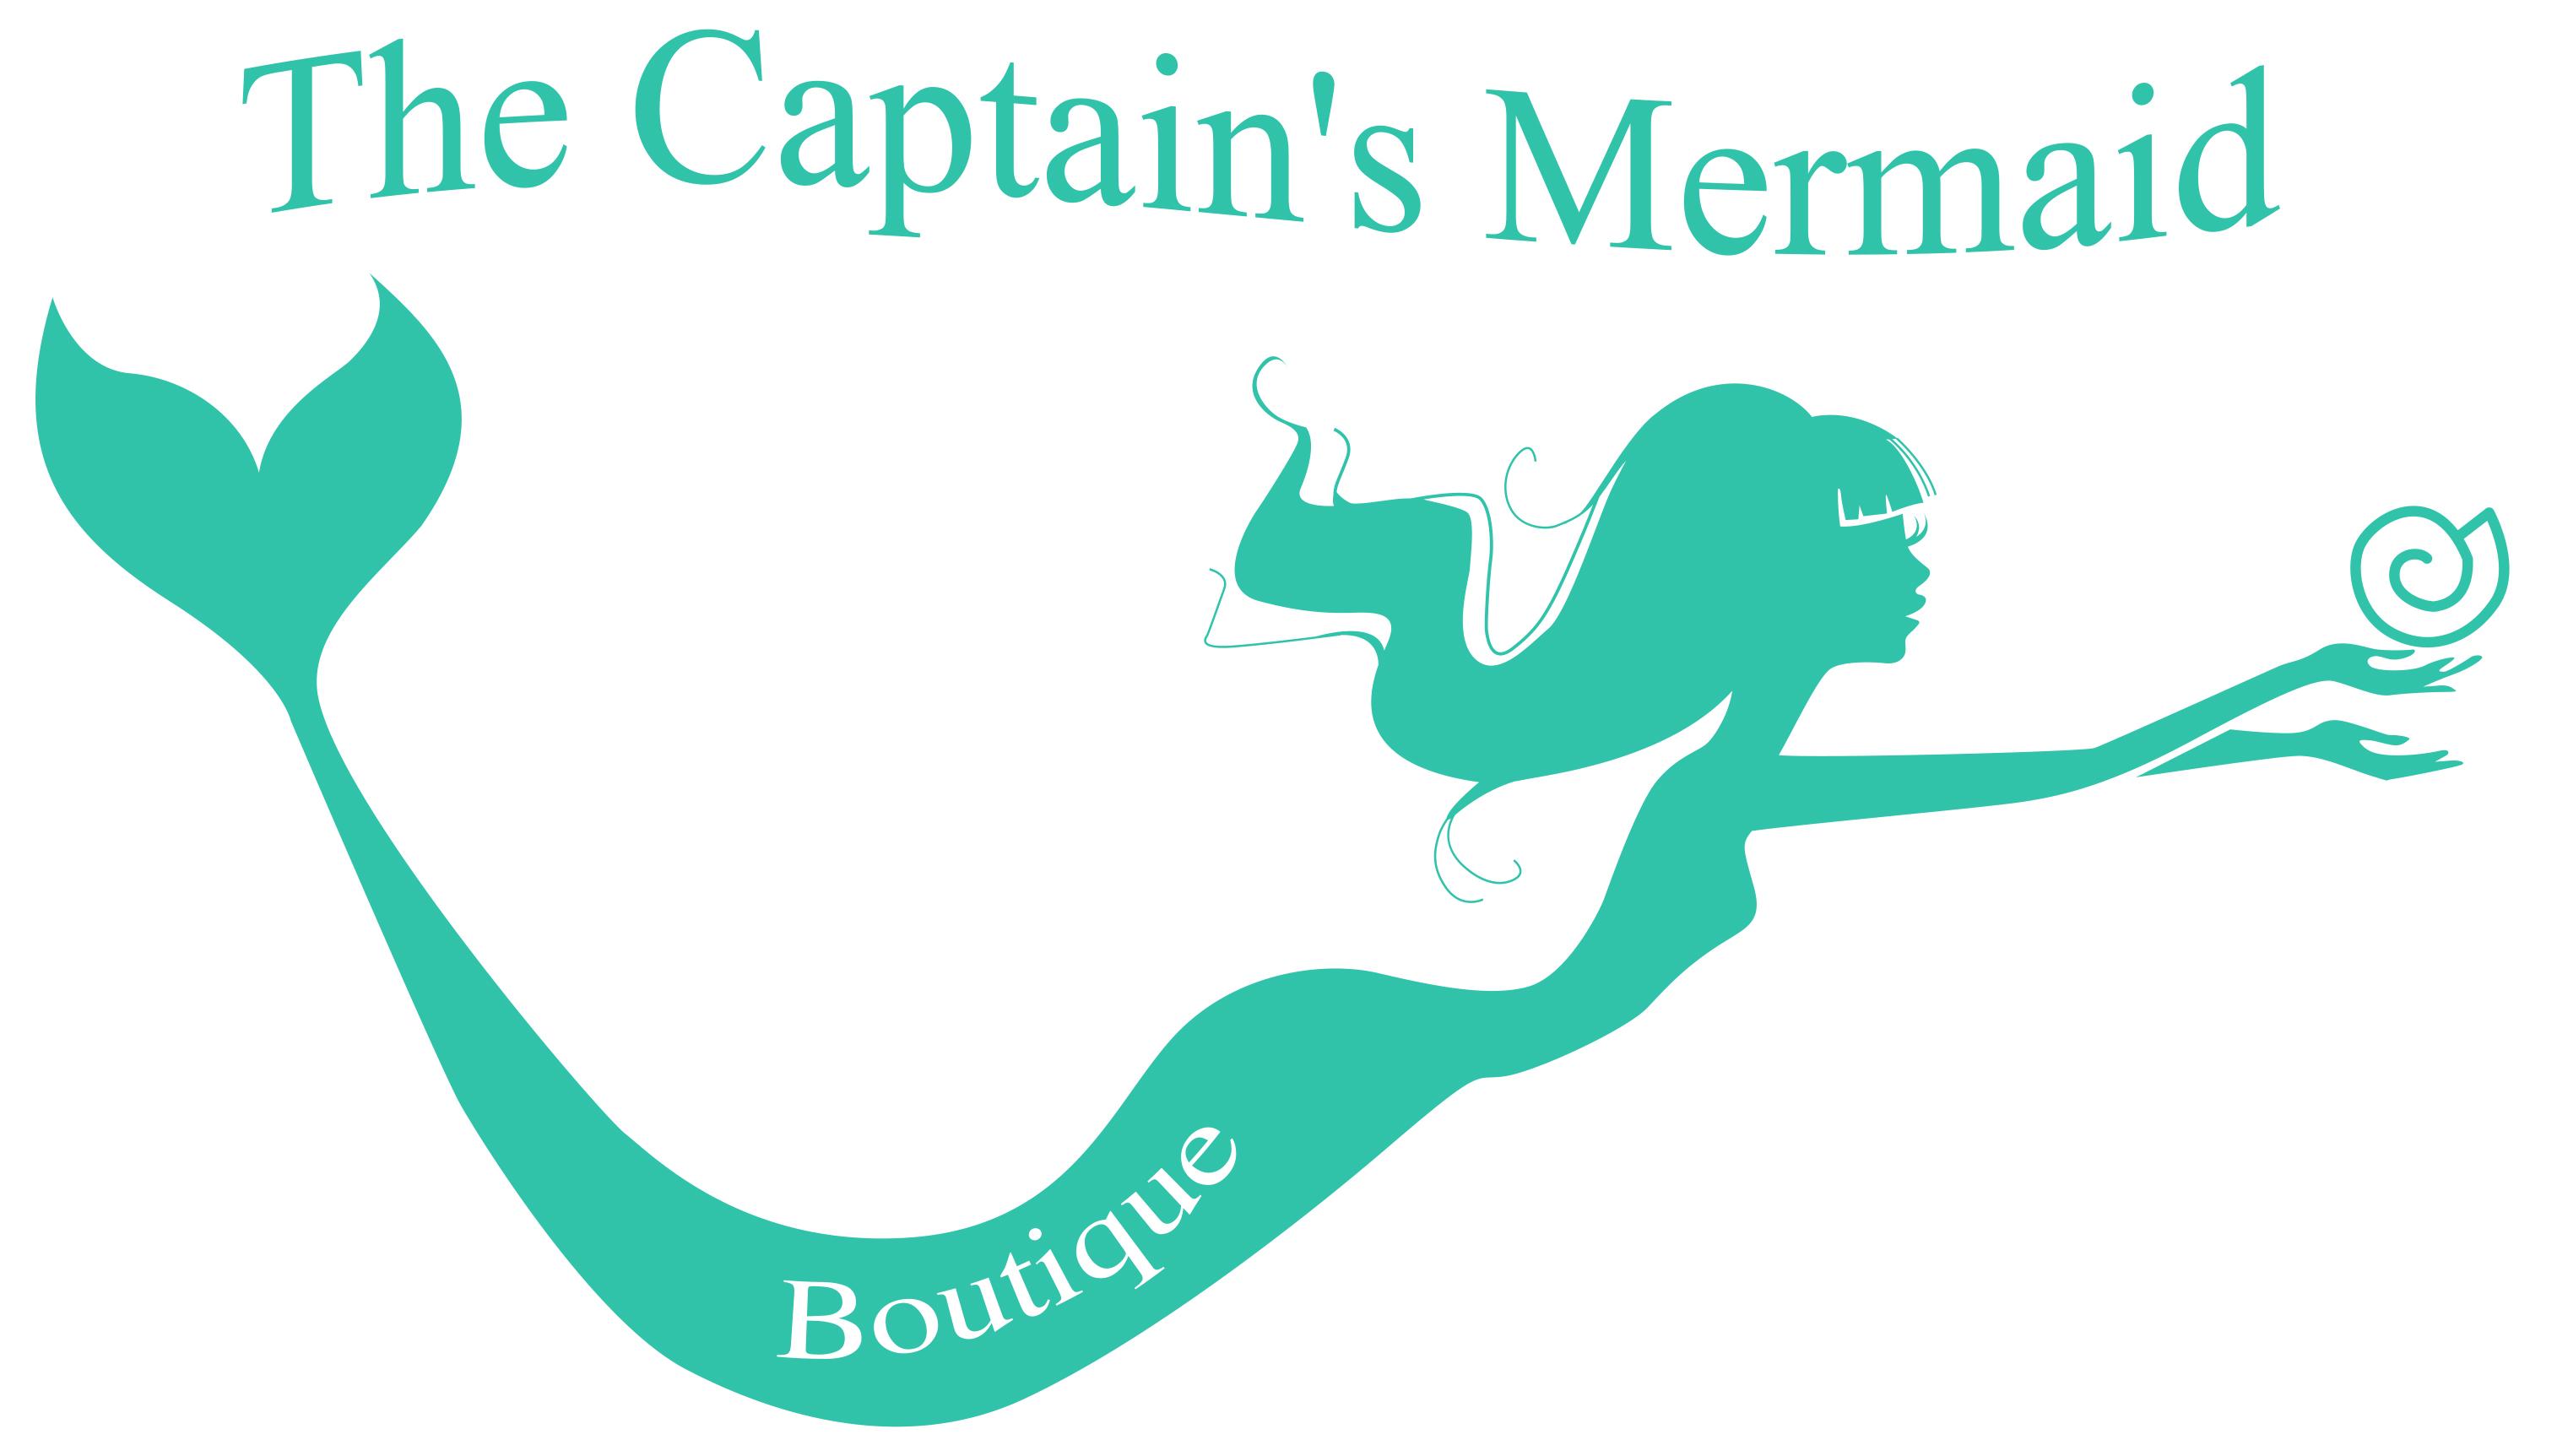 3029x1725 Captains Mermaid No Text Logo White Outline